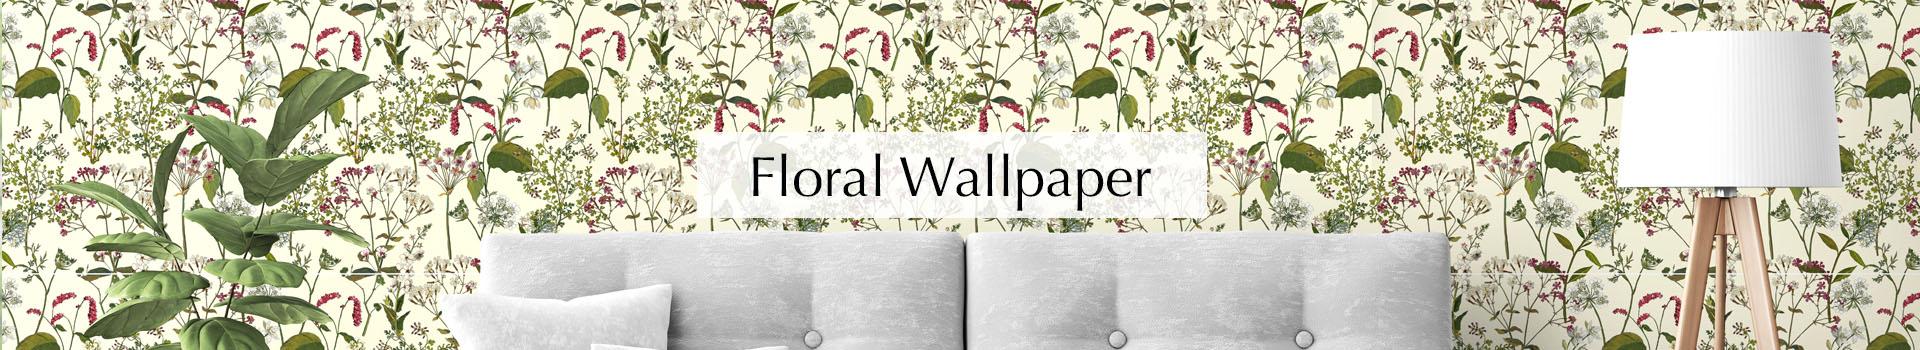 floral-wallpaper-2.jpg